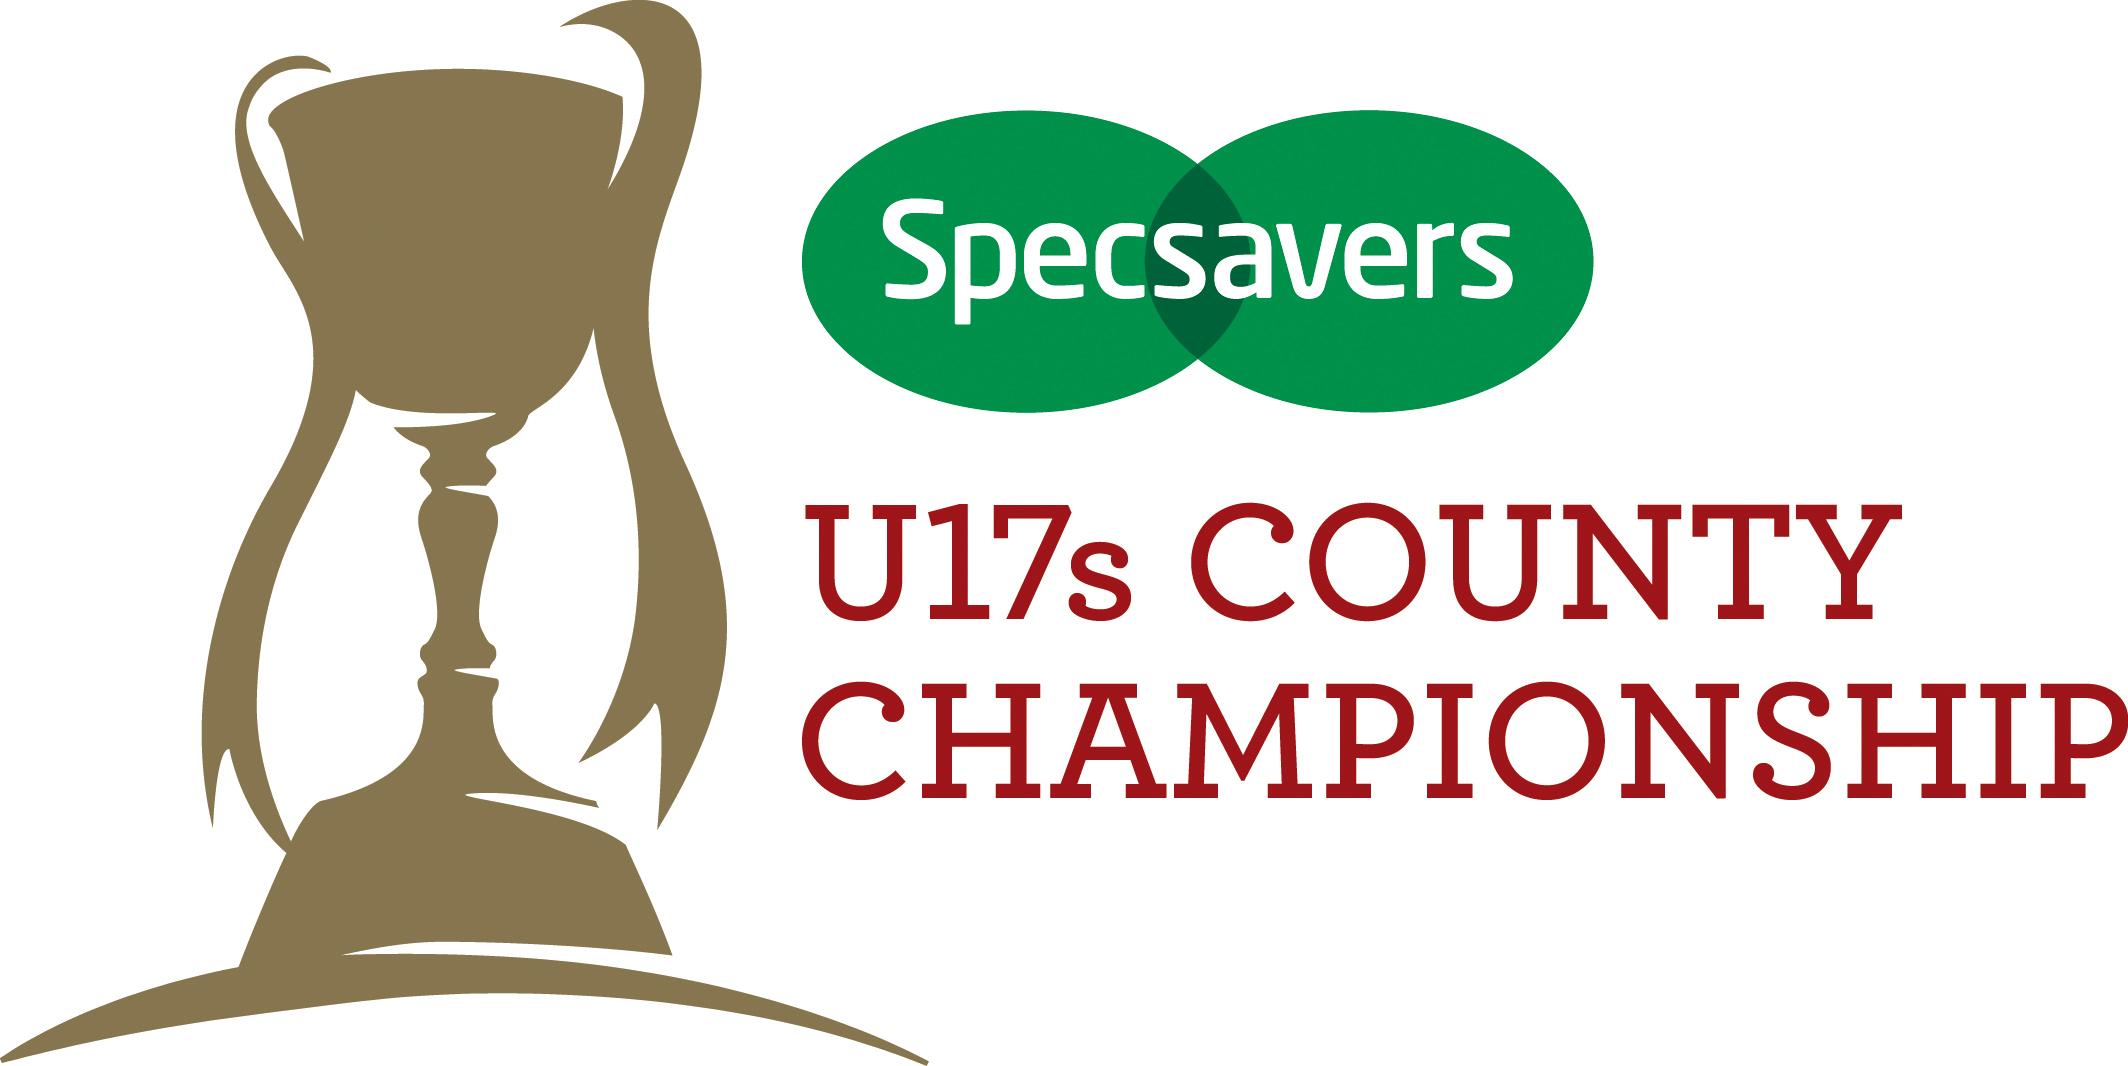 Specsavers_U17_County_Championship_Logo__2_